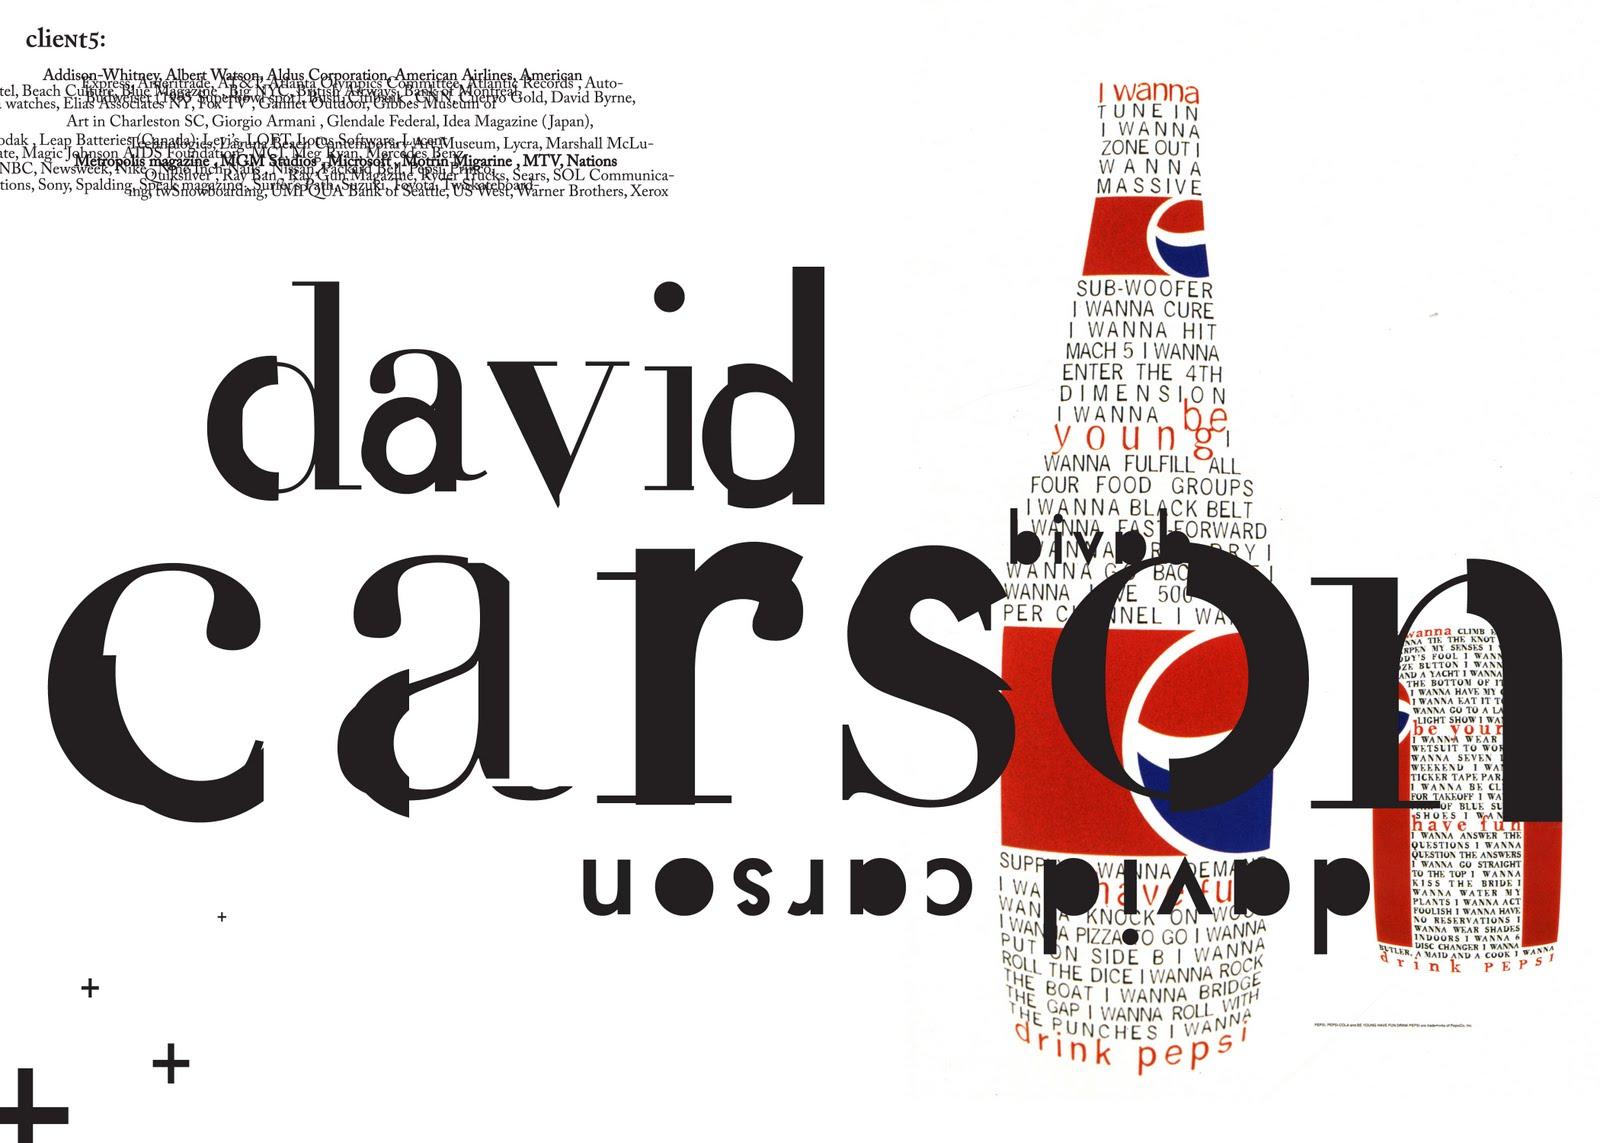 David Carson best works-ის სურათის შედეგი